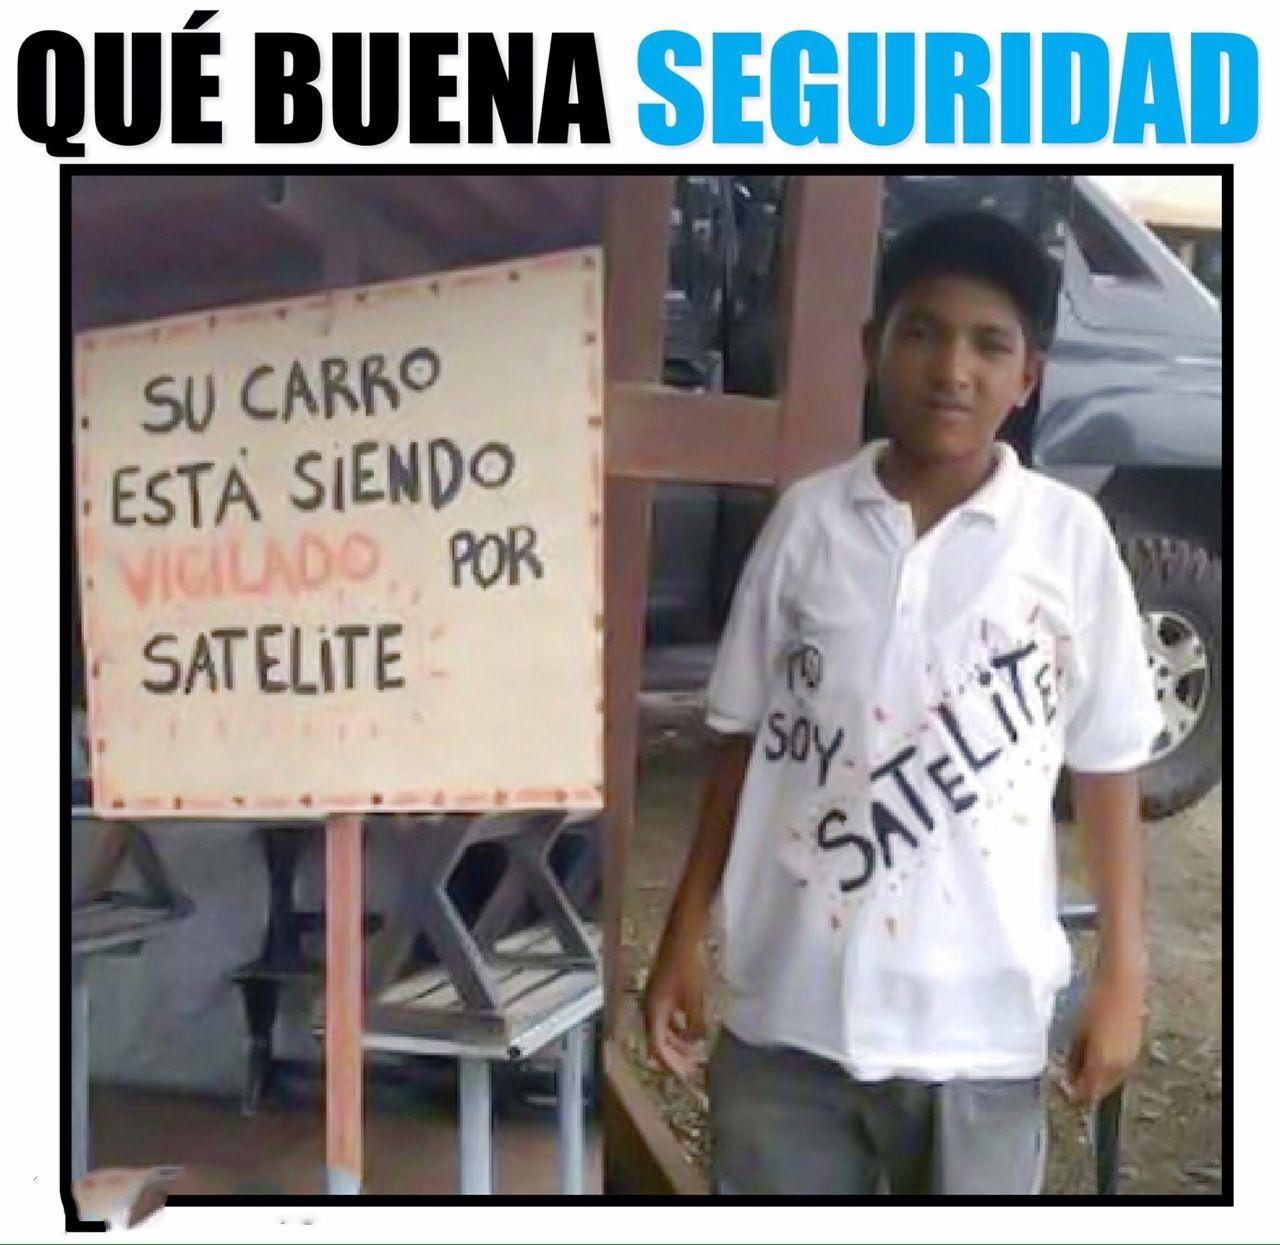 Imágenes Graciosas Para Whatsapp Memes Chistes Chistesmalos Imagenesgraciosas Humor Funny Spanish Memes Funny Memes Pinterest Memes